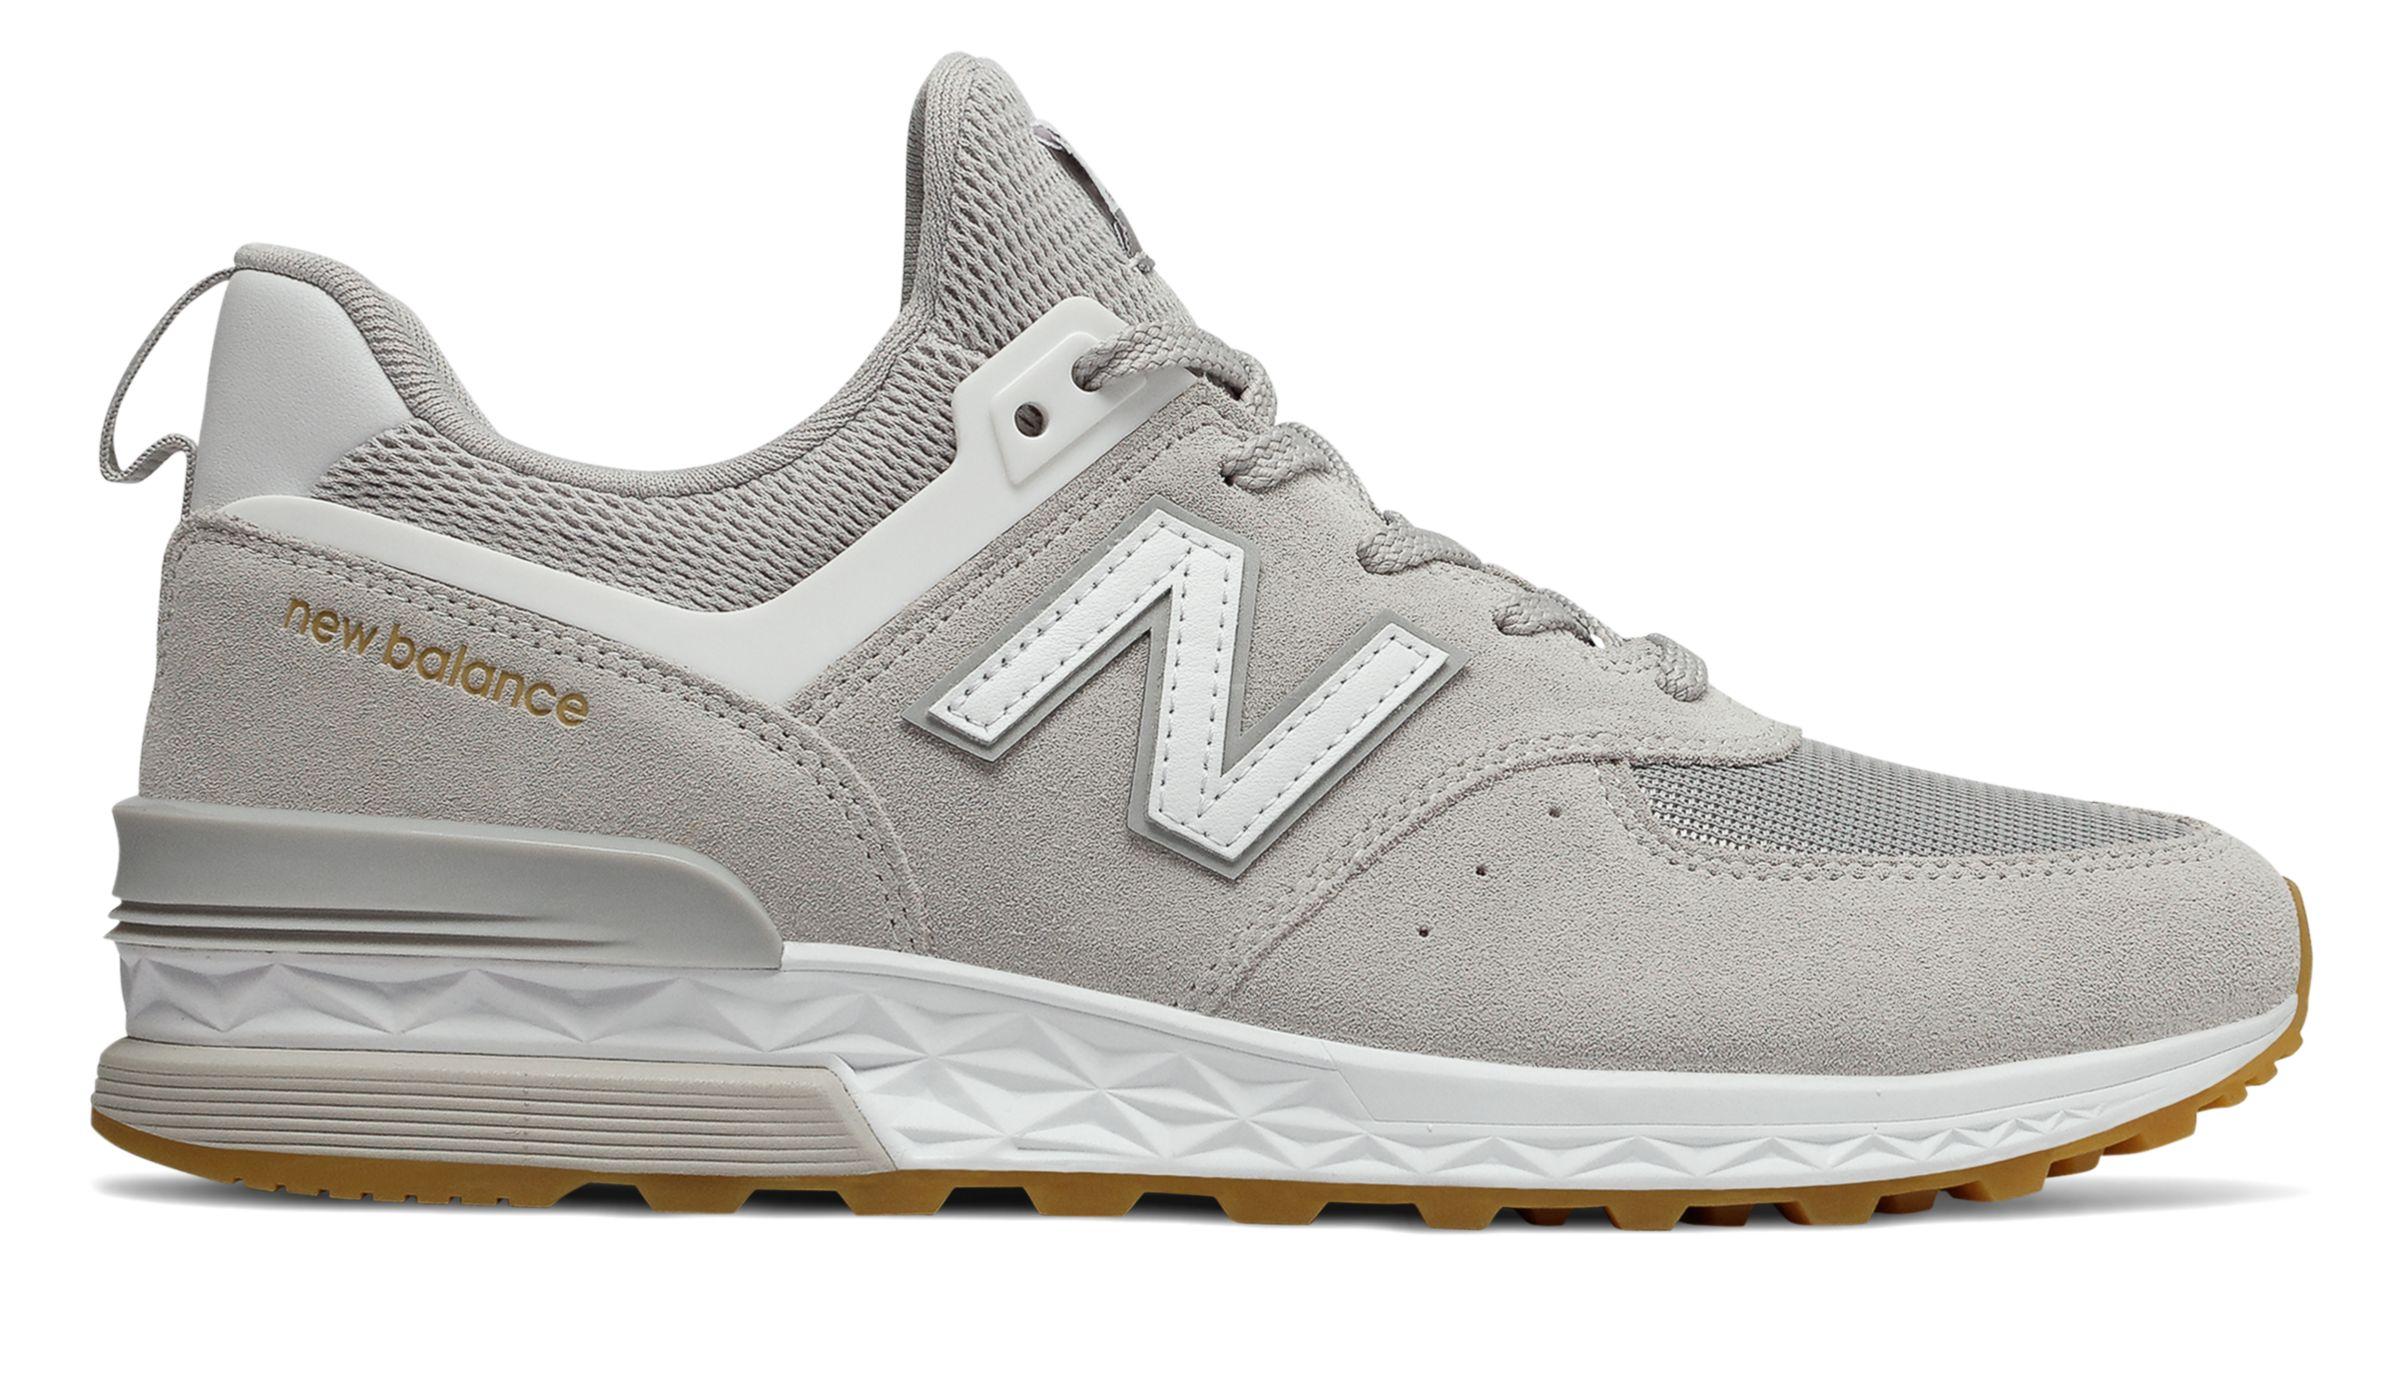 New Balance Men s 574 Sport Shoes Grey with White   eBay 1bee1b14c48